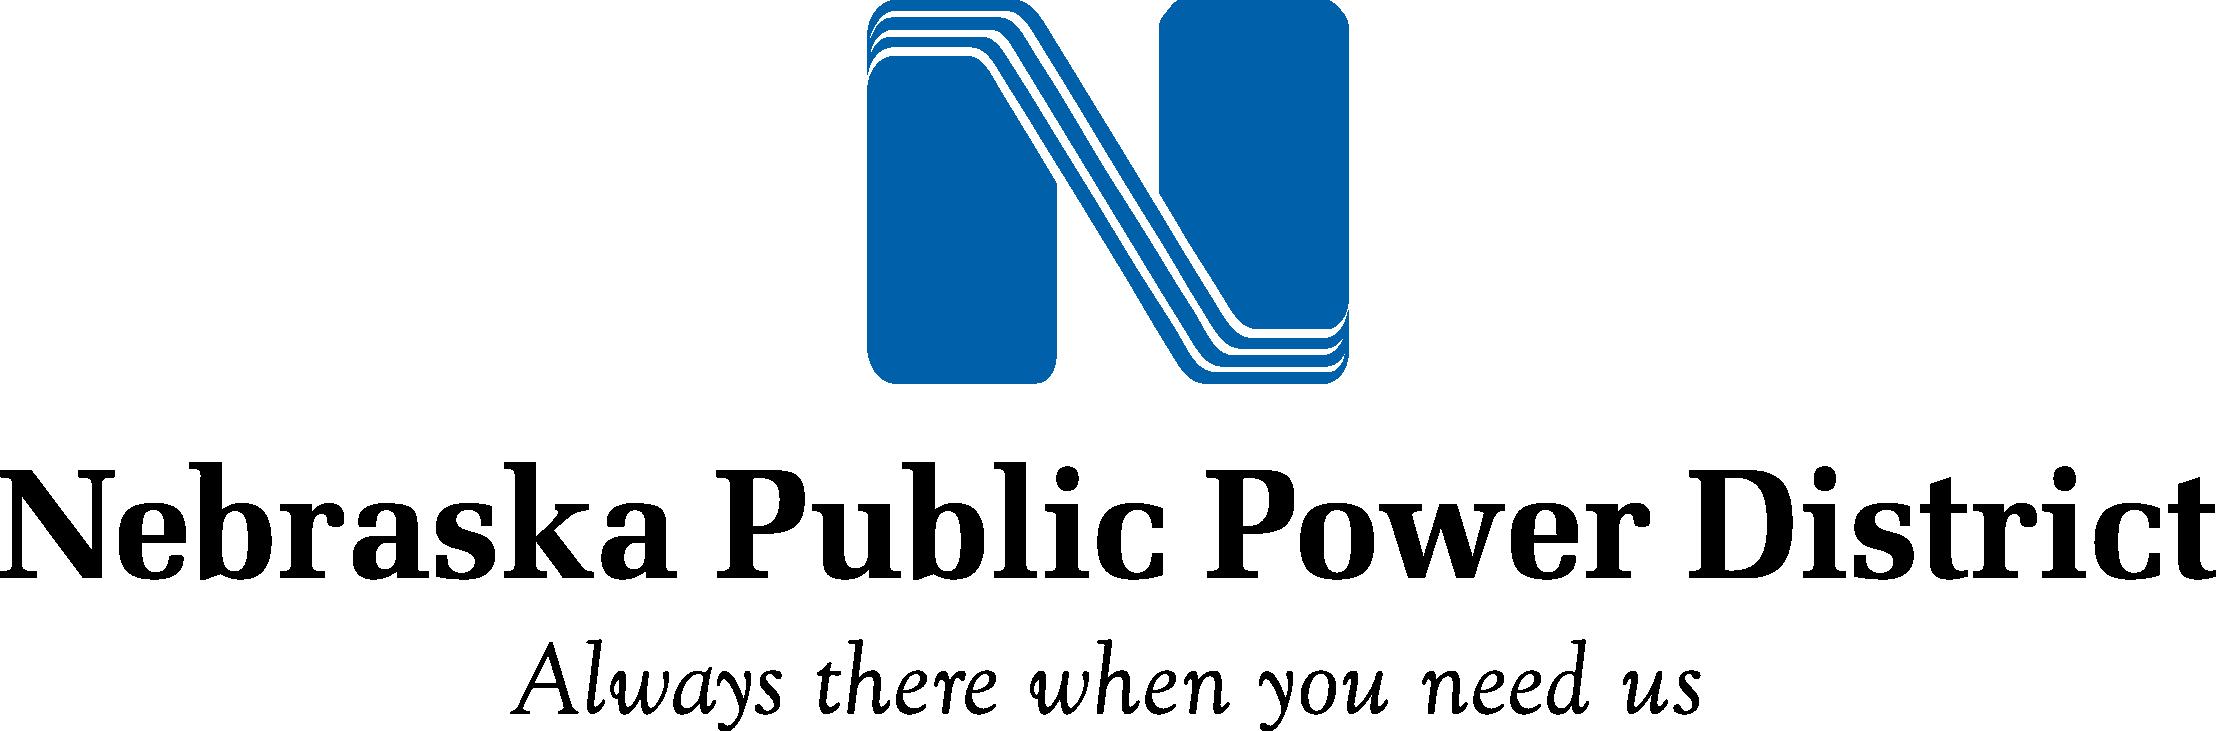 Nebraska Public Power District Logo.png